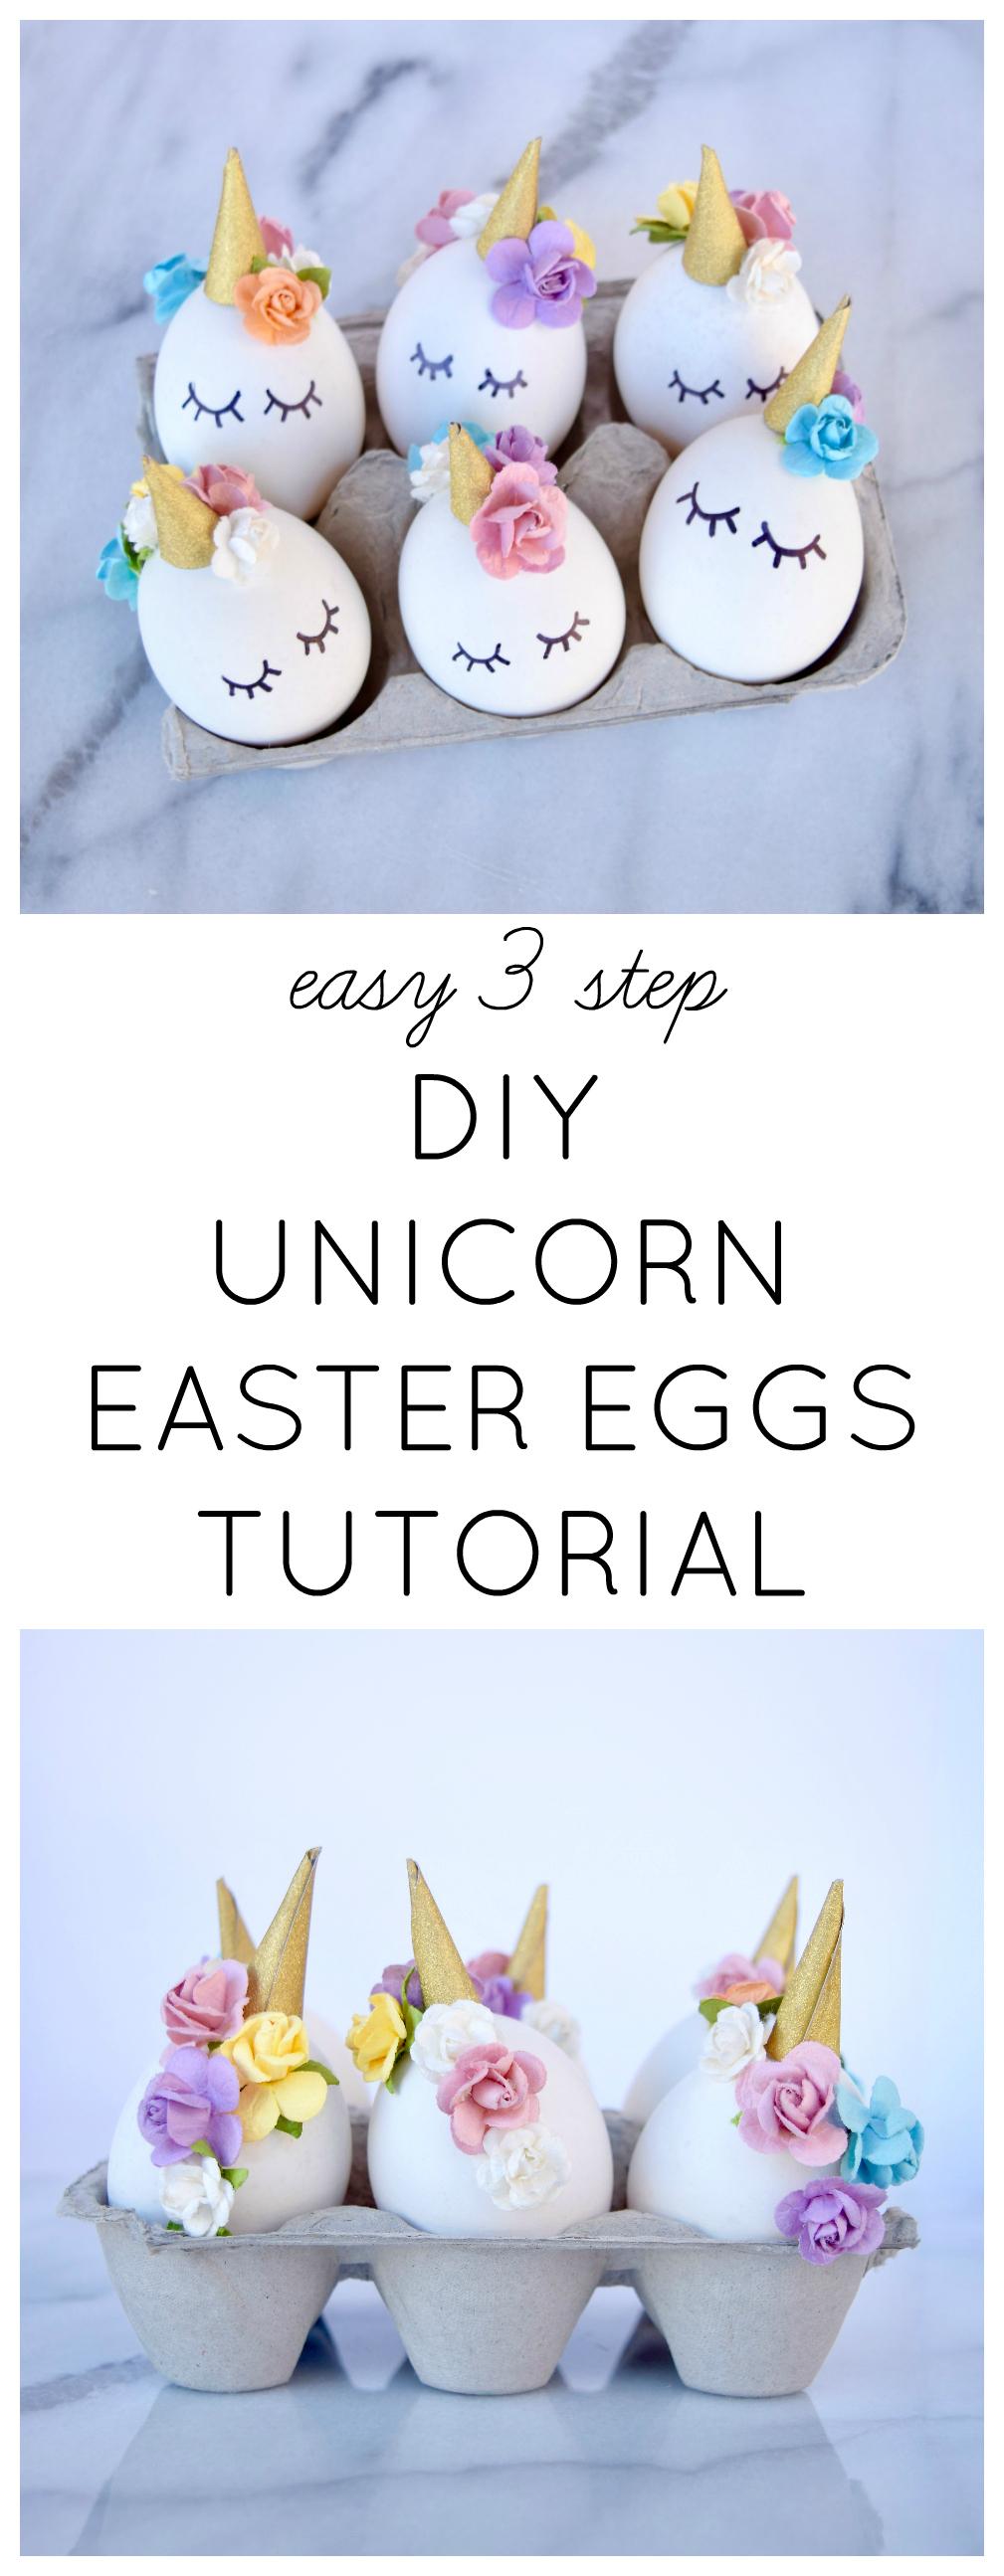 EASY 3 STEP DIY UNICORN EASTER EGGS TUTORIAL